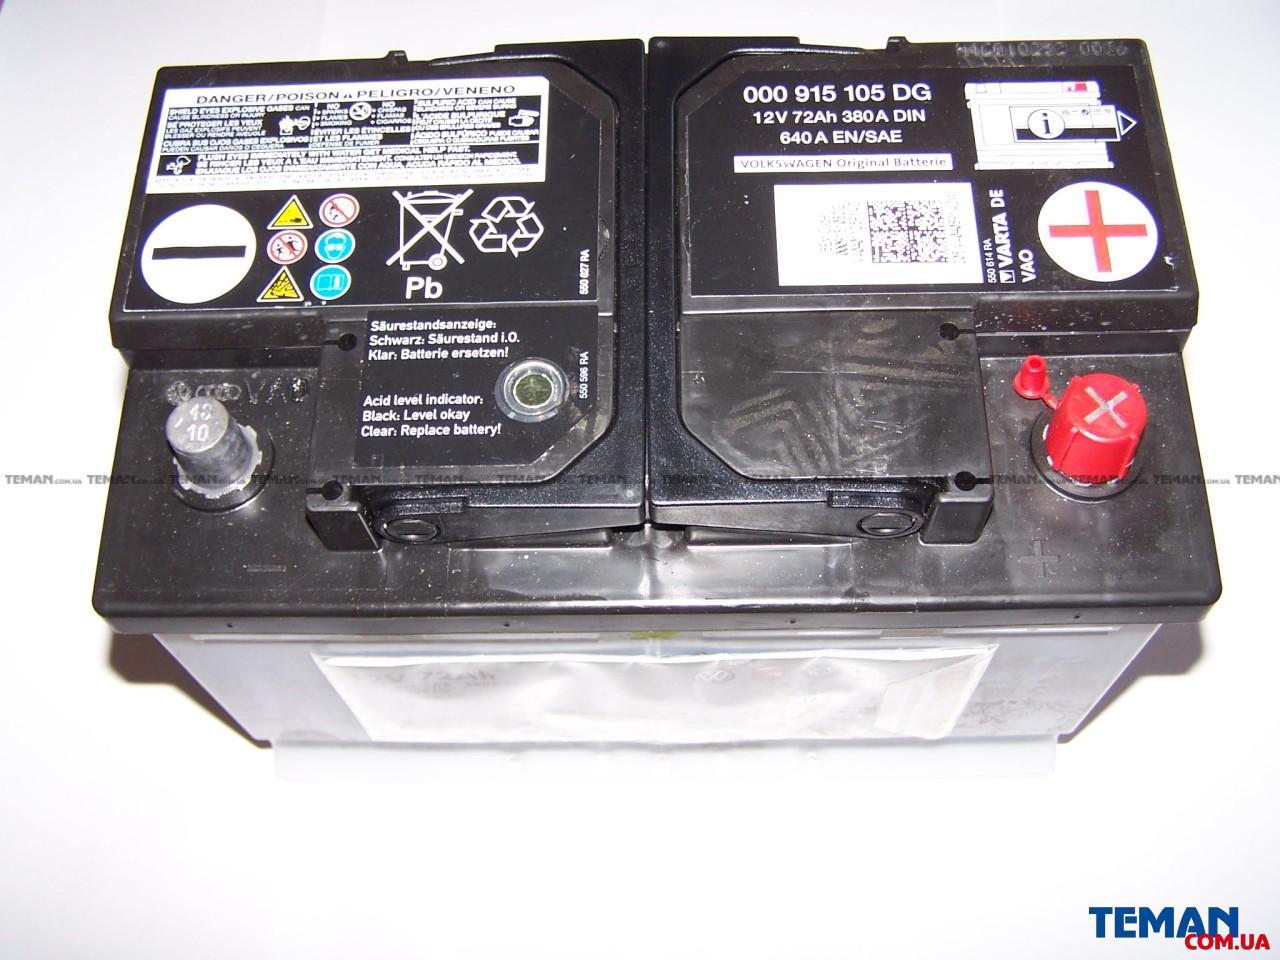 Купить акумуляторна батарея 72АH/380AVAG 000915105DG